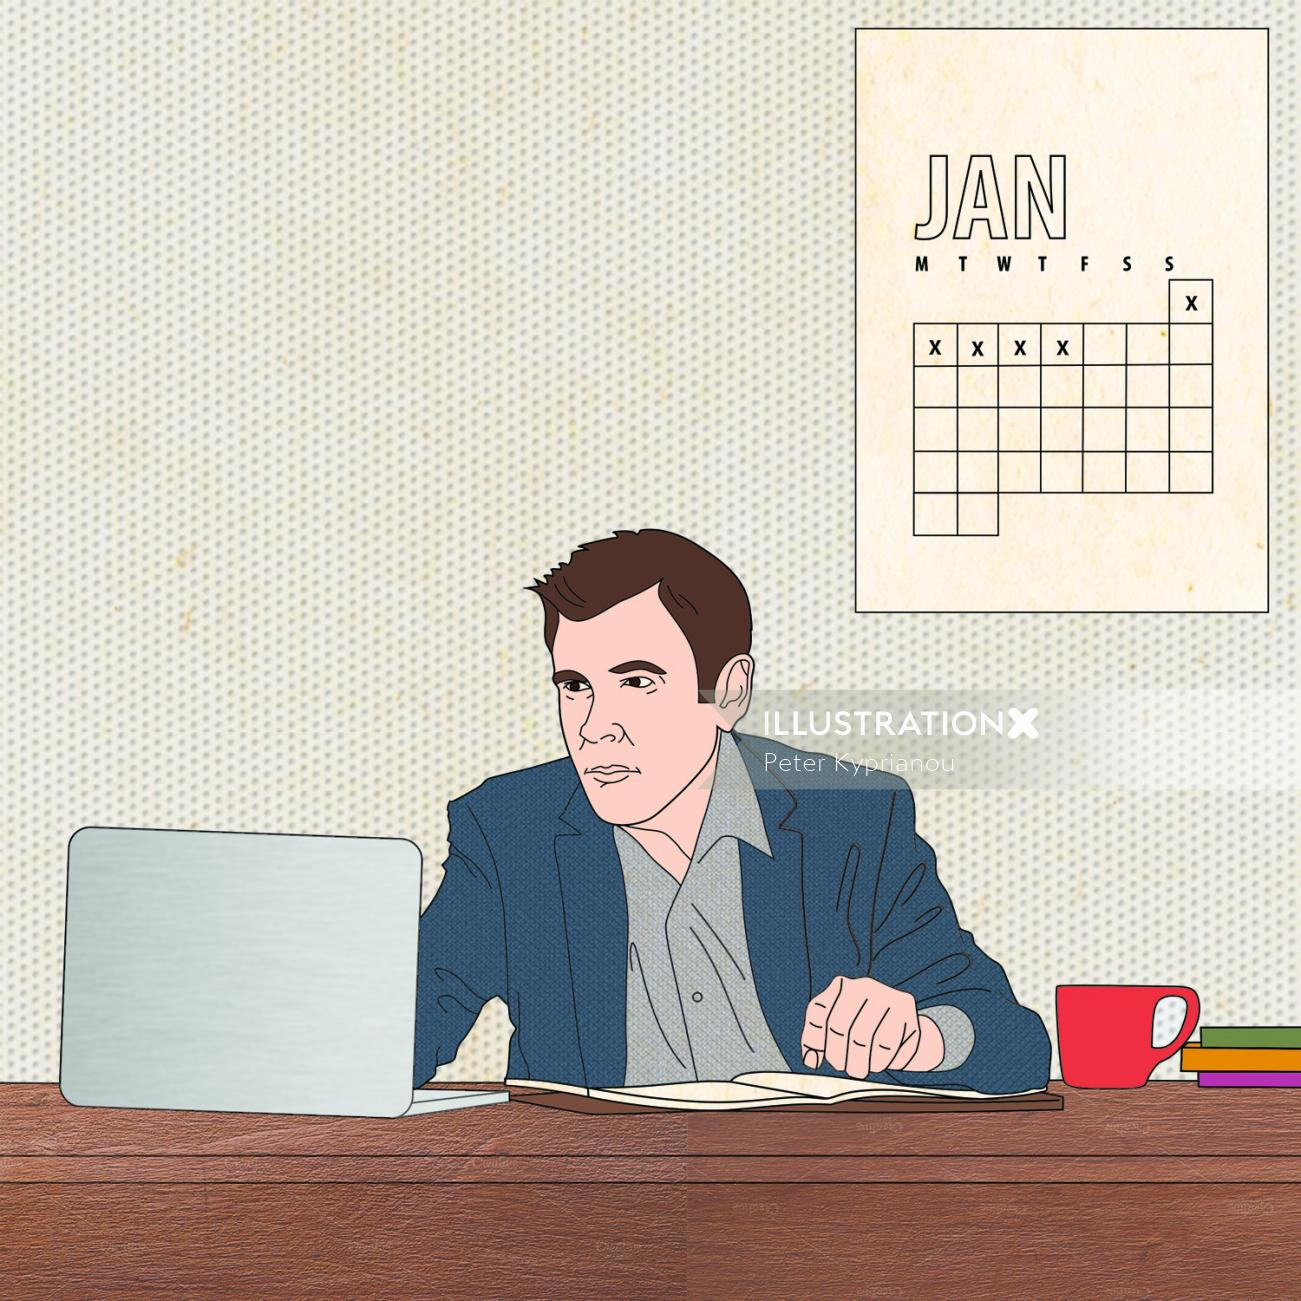 Lifestyle illustration of working man